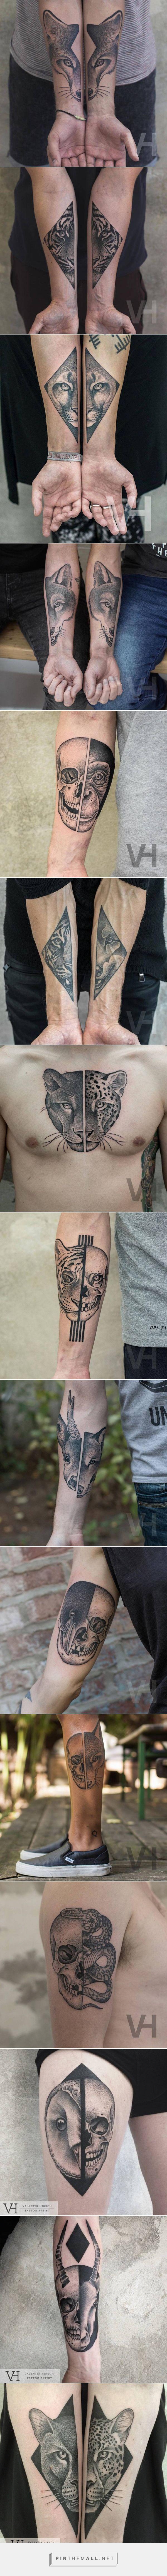 Split Animals Faces Tattoos Inked on Separate Sides – Fubiz Media - created via https://pinthemall.net